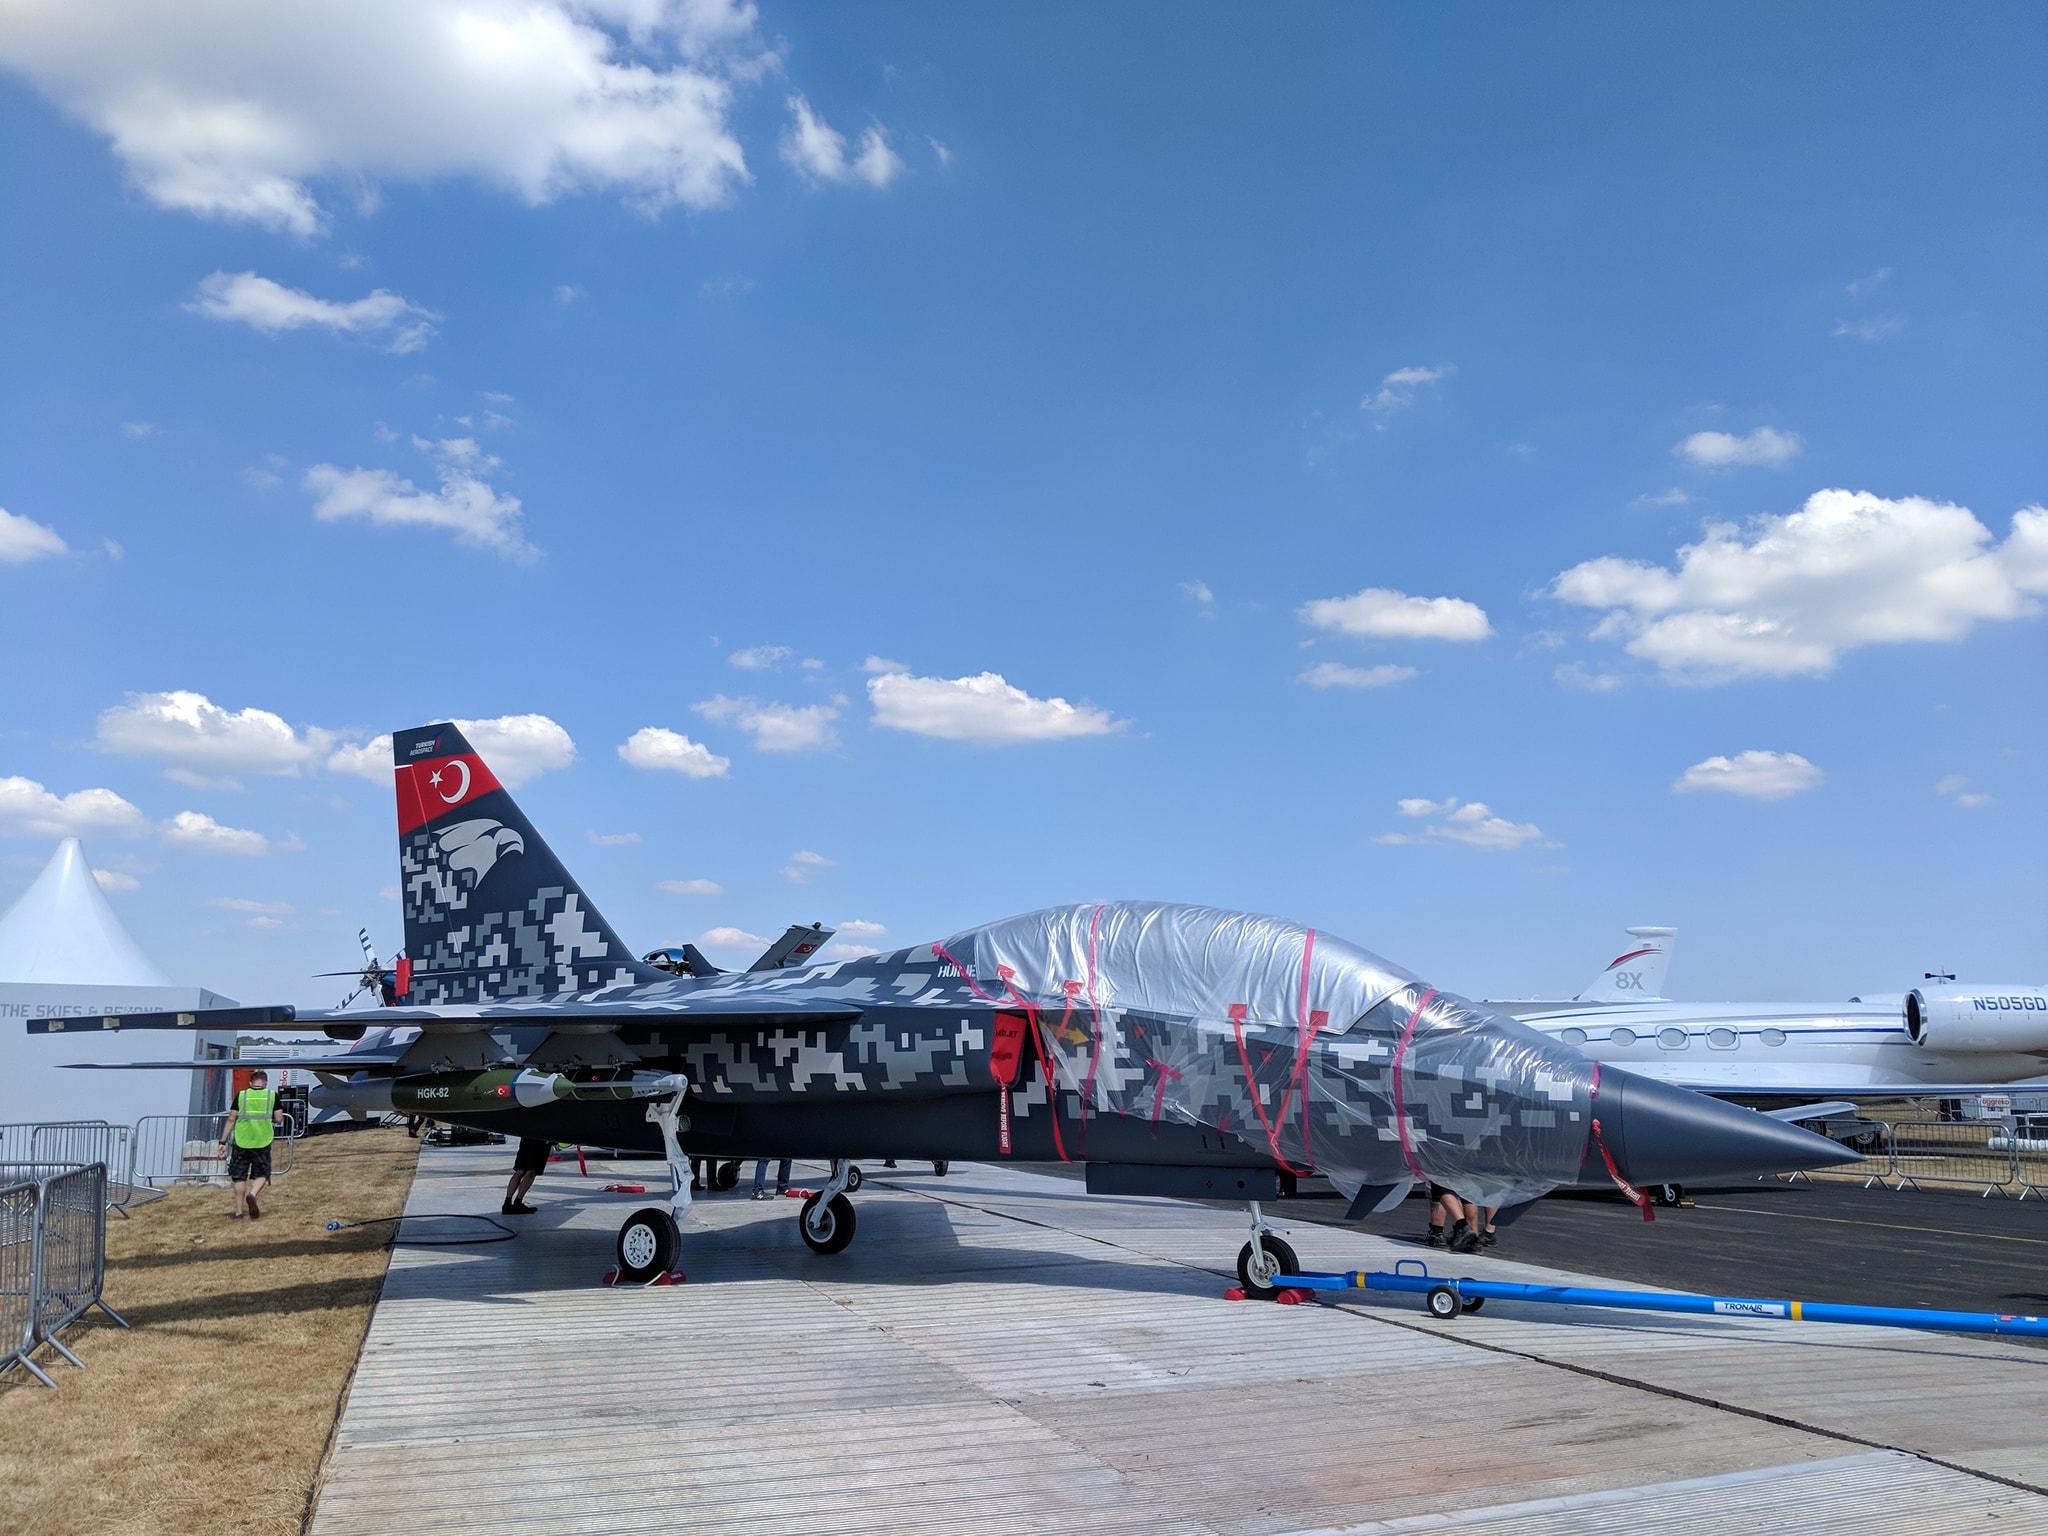 Презентация турецкого реактивного учебно-боевого самолета Hurjet